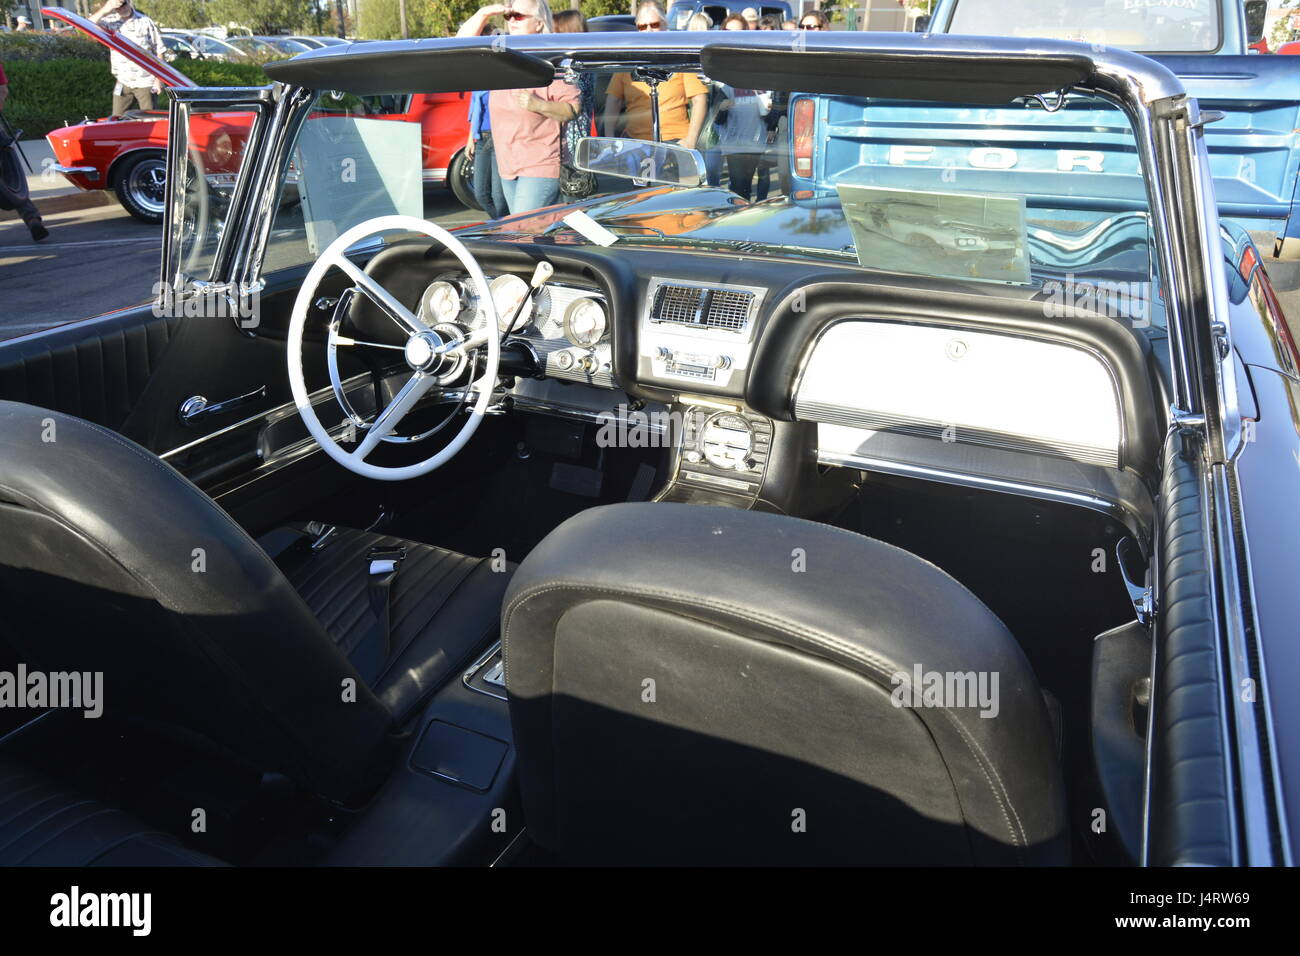 1957 chevy, chevrolet, black bel air at small town main street car